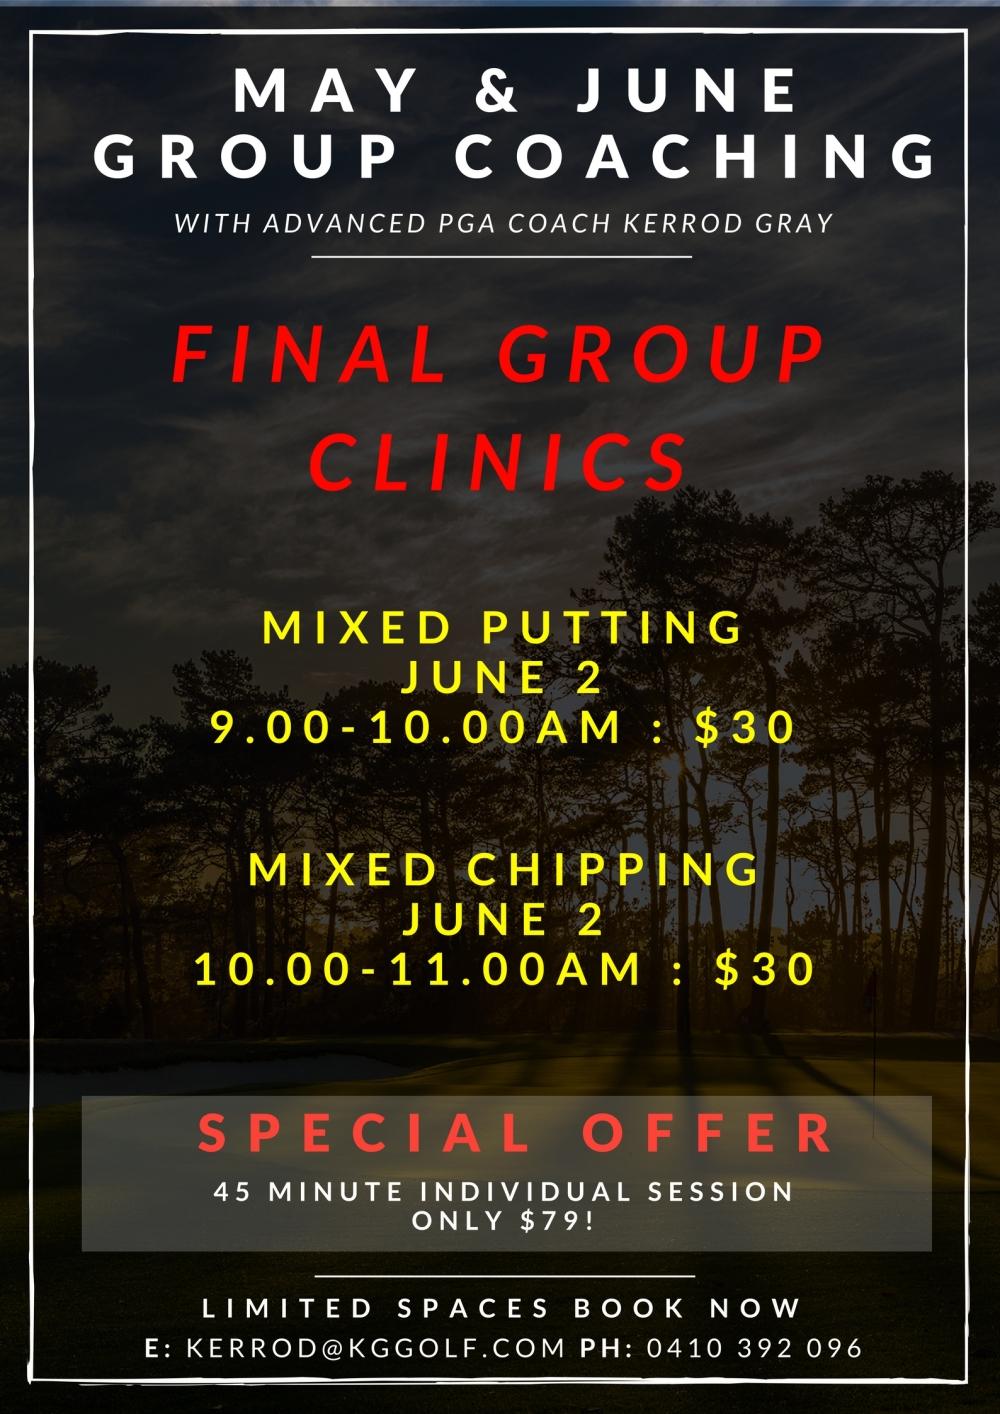 Copy of May June Golf Coaching Clinics (2)